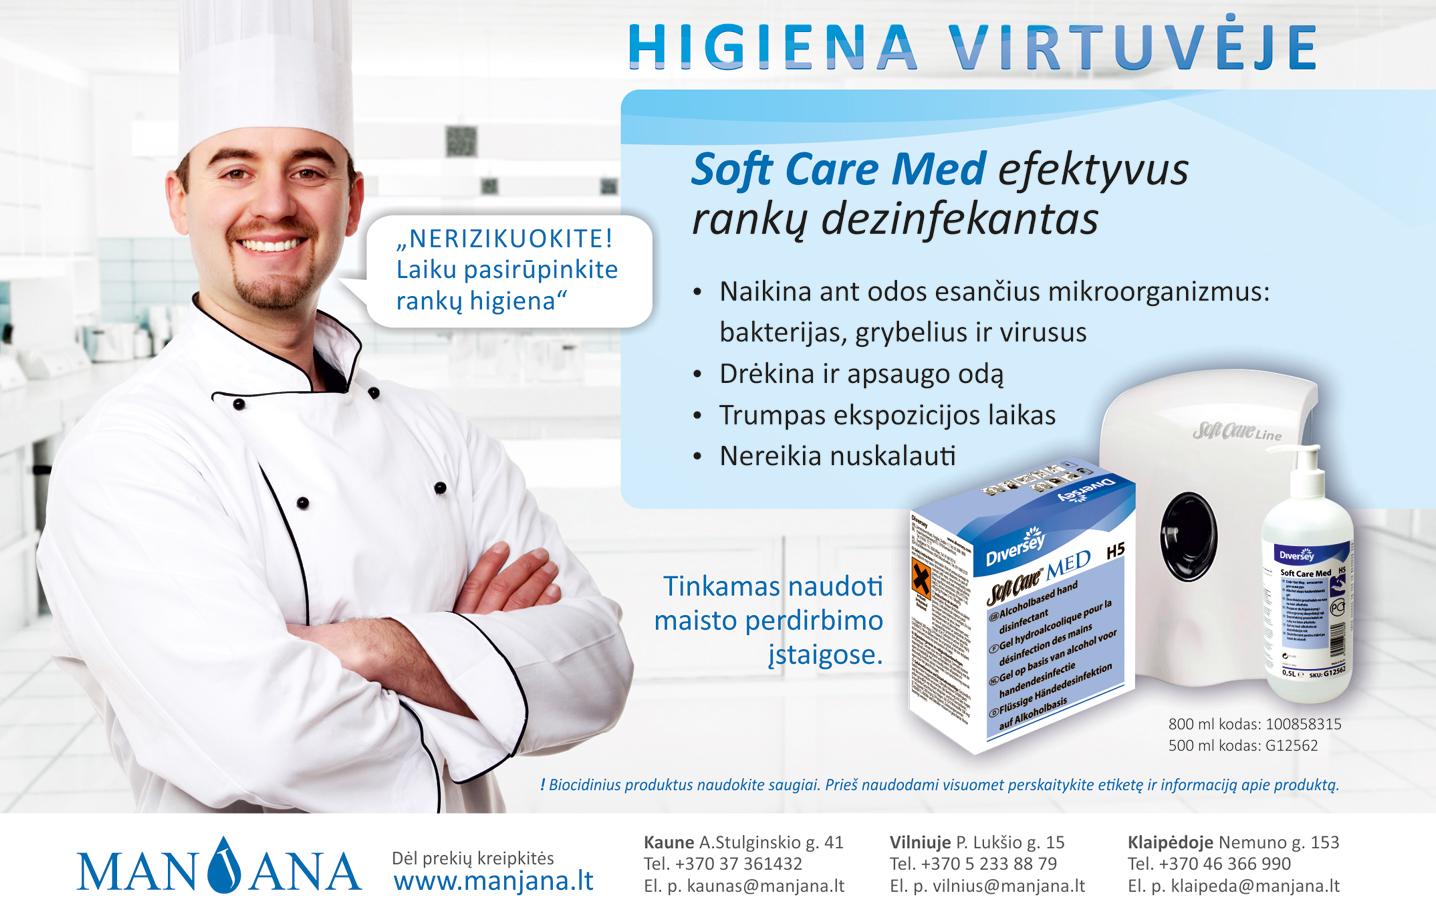 Manjana_Produkto-Reklama-Soft-Care-Med_SP_180x118-_Fcb